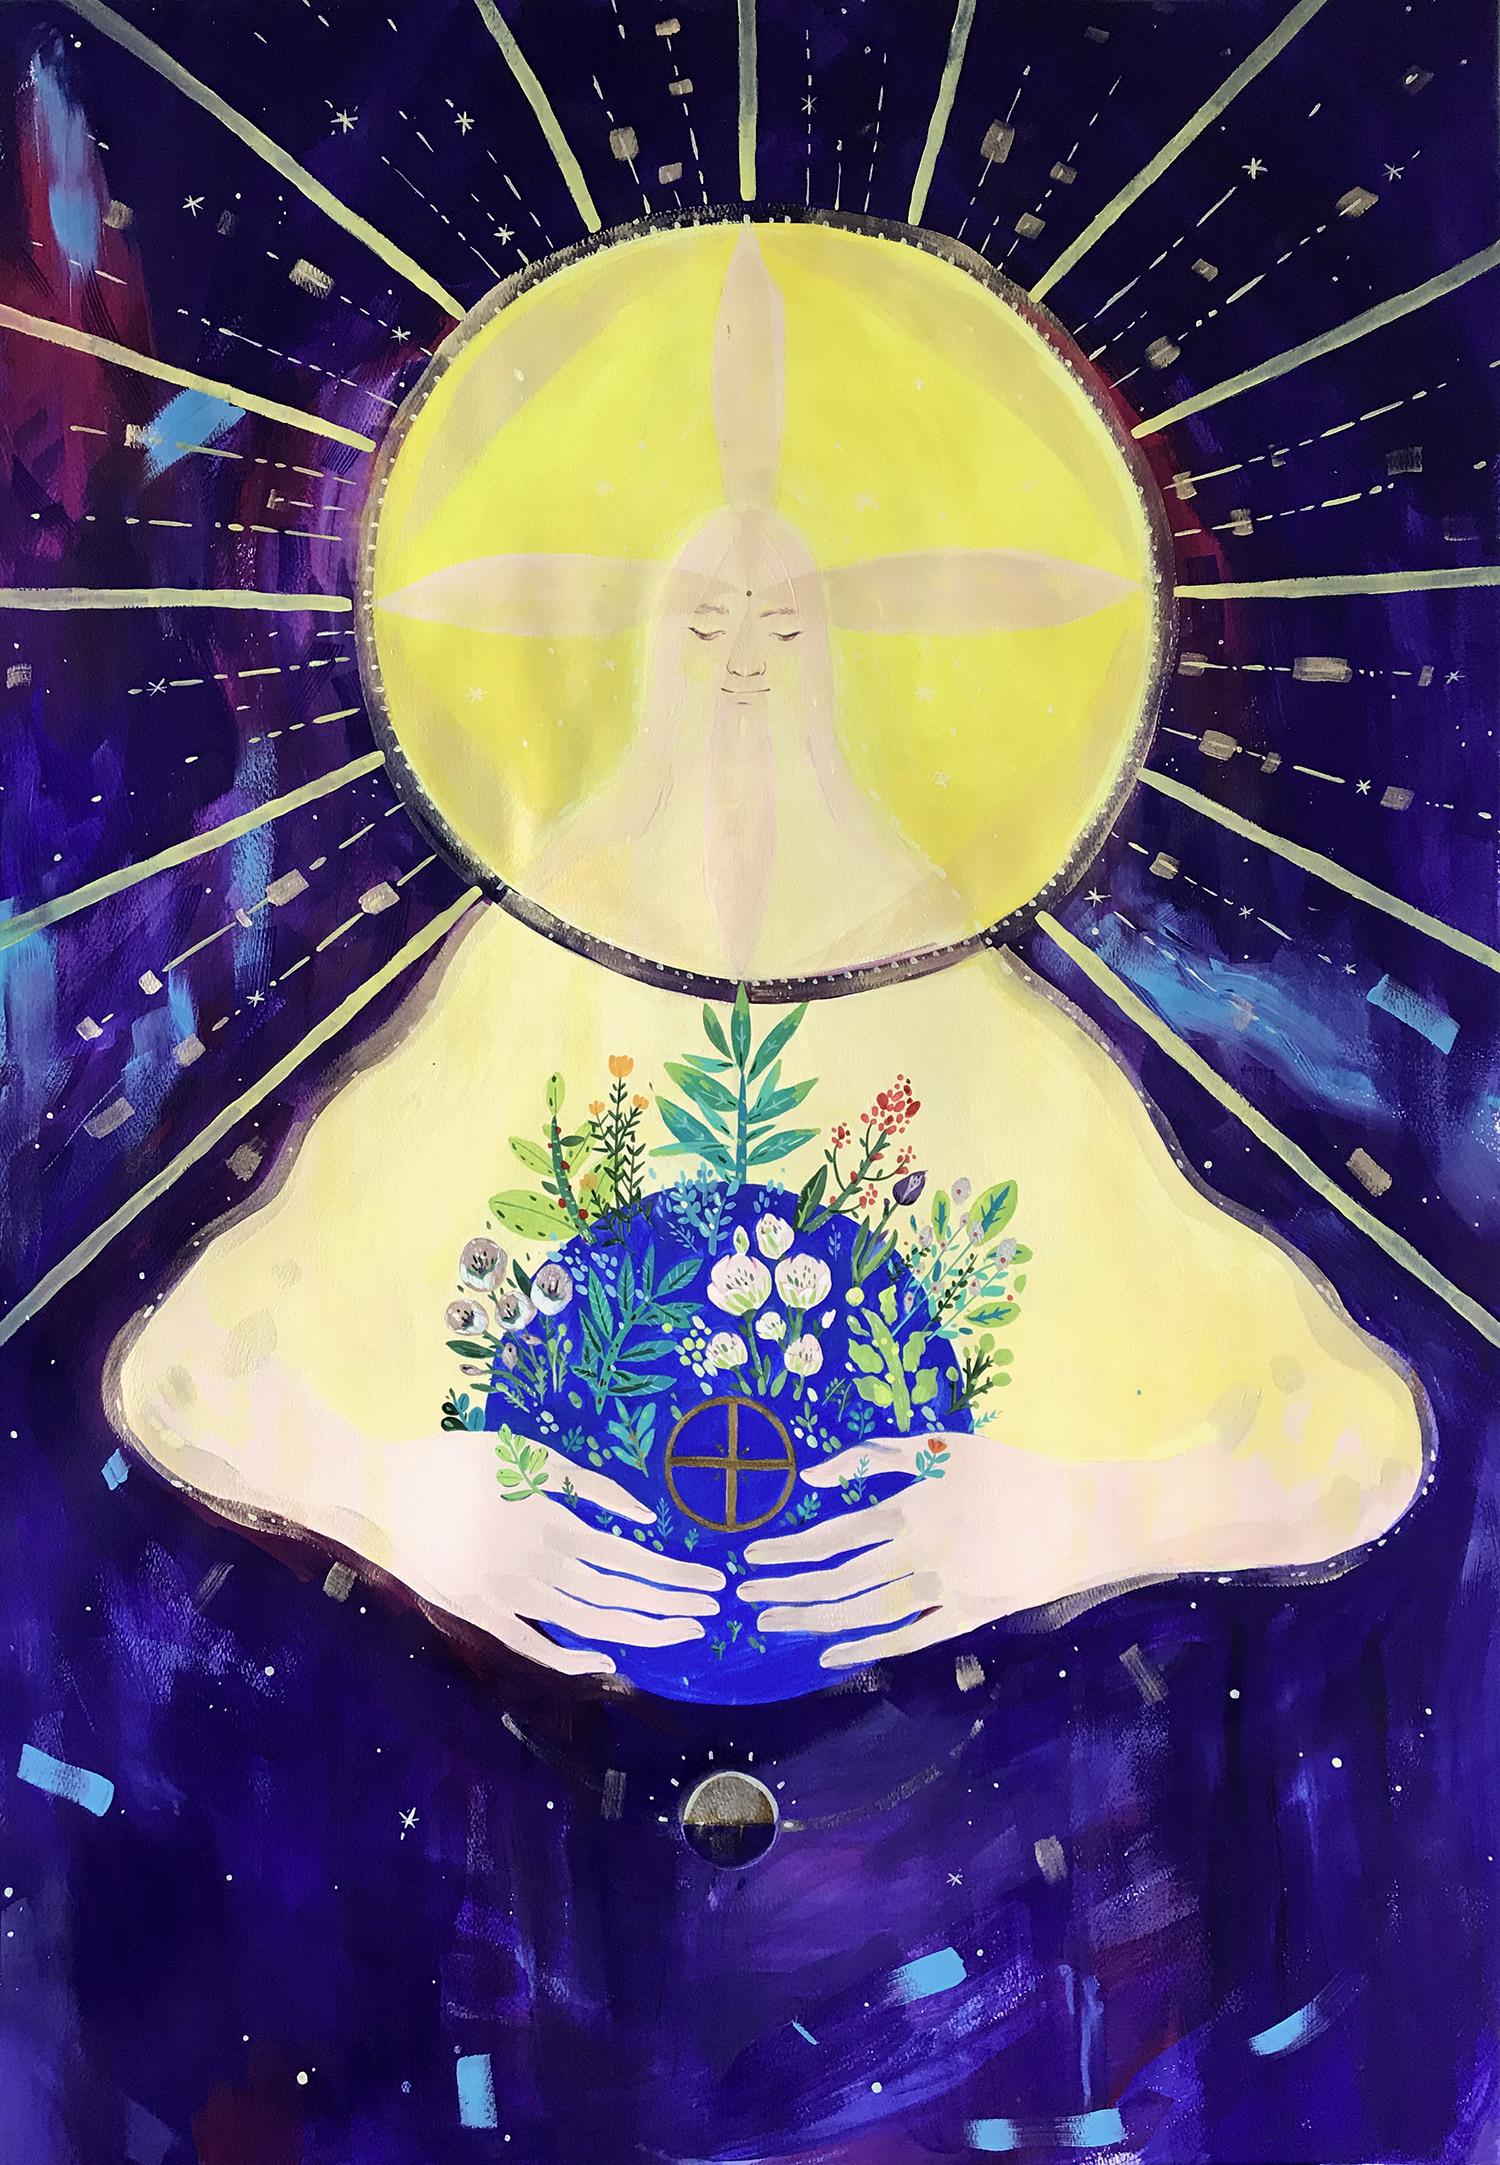 the-holy-sun-illustratio-allistration